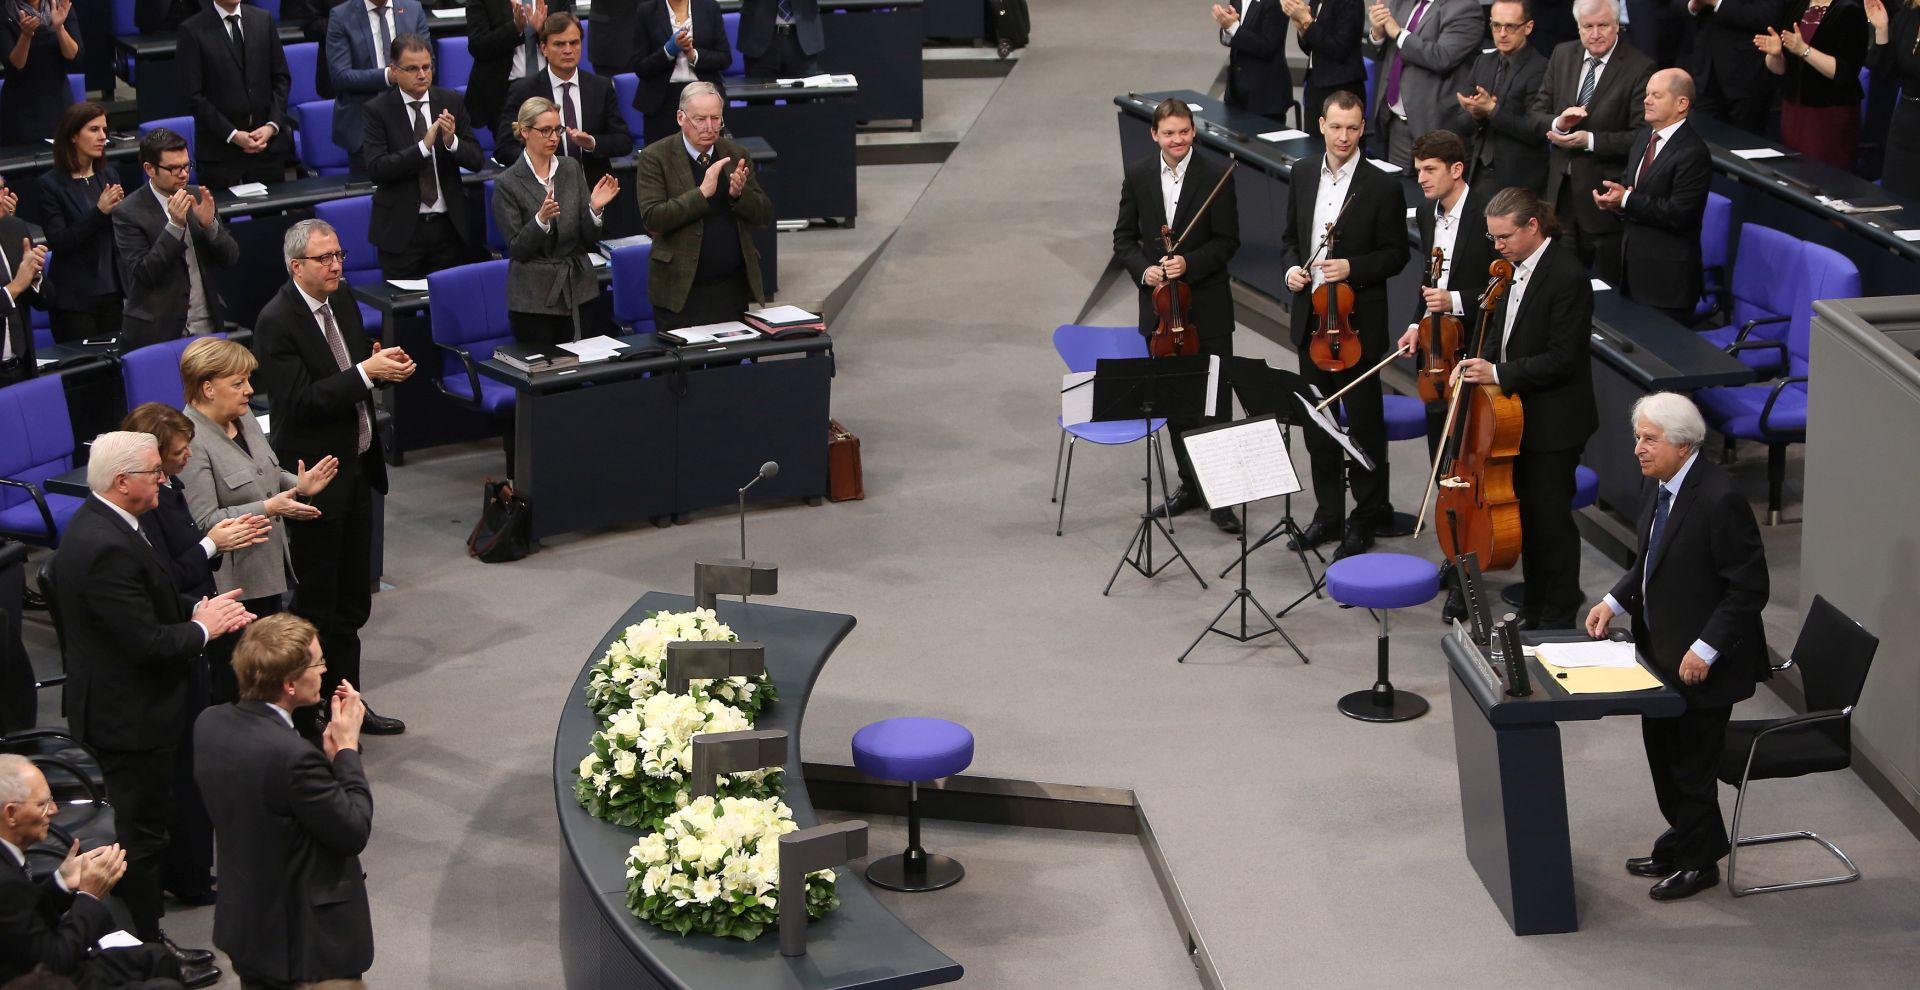 NJEMAČKA Bundestag upozorio na rastući antisemitizam